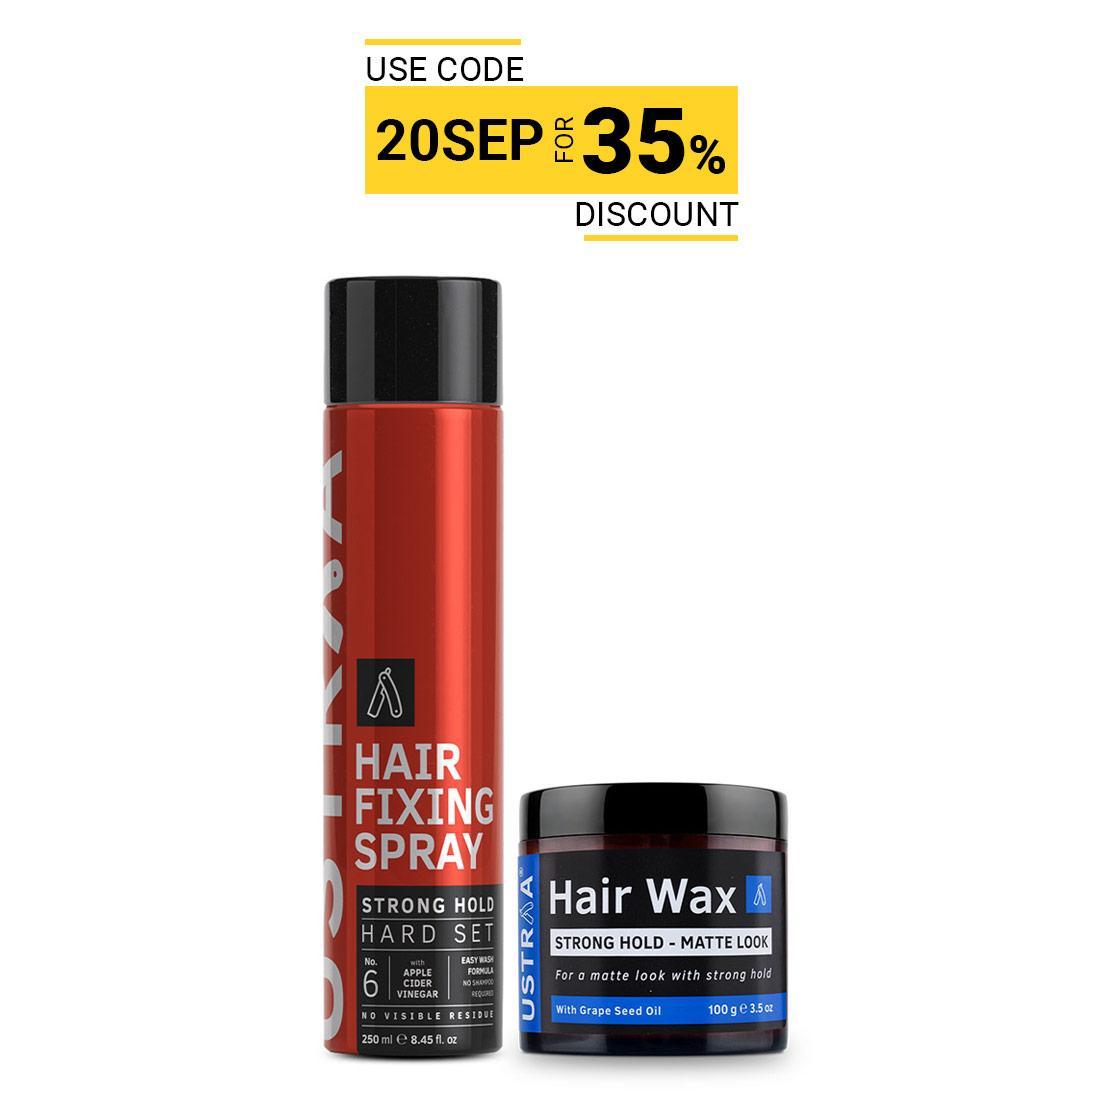 Ustraa Hair Styling Kit For Men (Matte Look): Hair Fixing Spray + Hair Wax